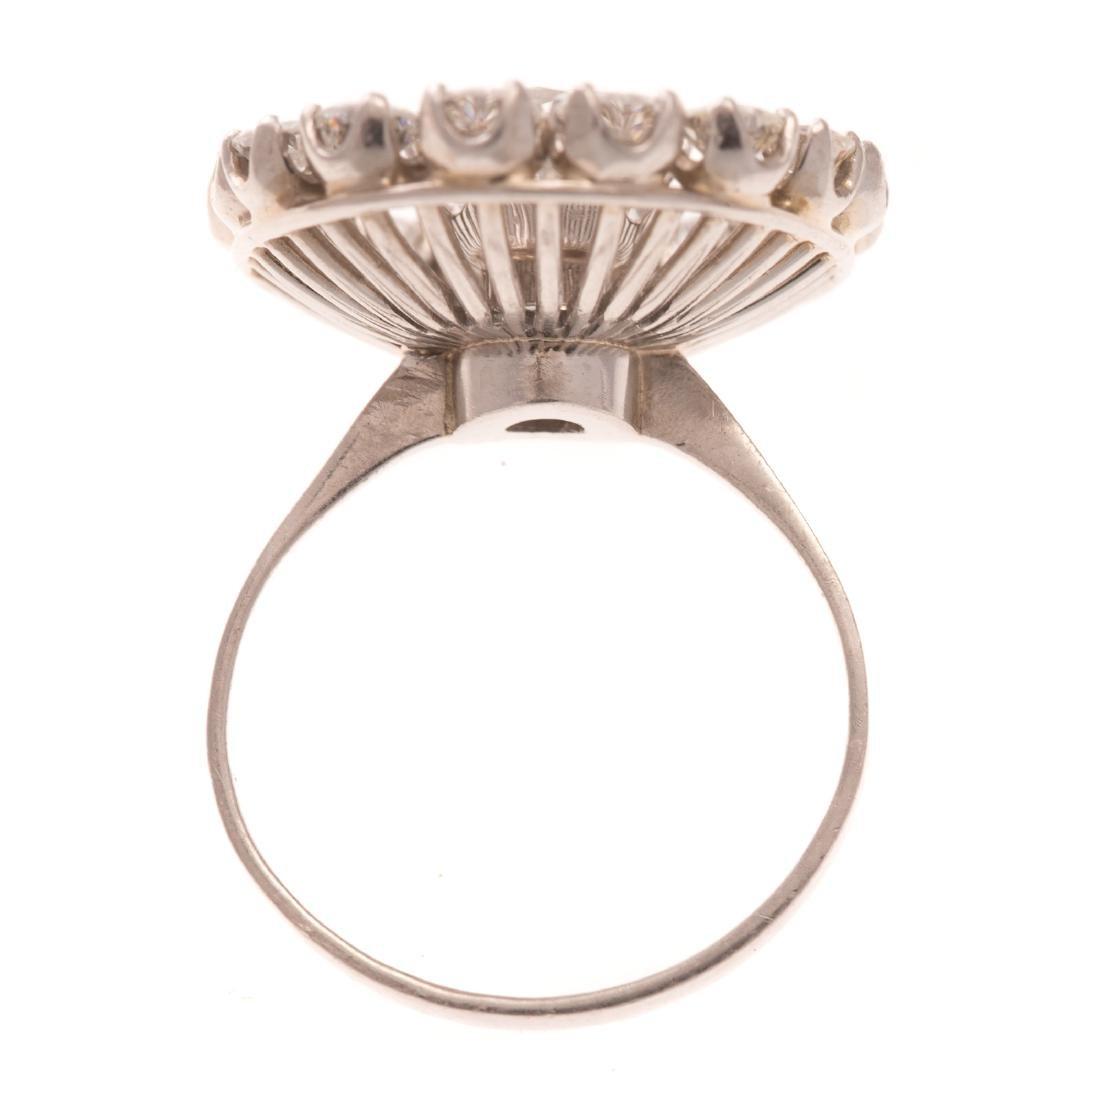 A Lady's Platinum Diamond Cocktail Ring - 3